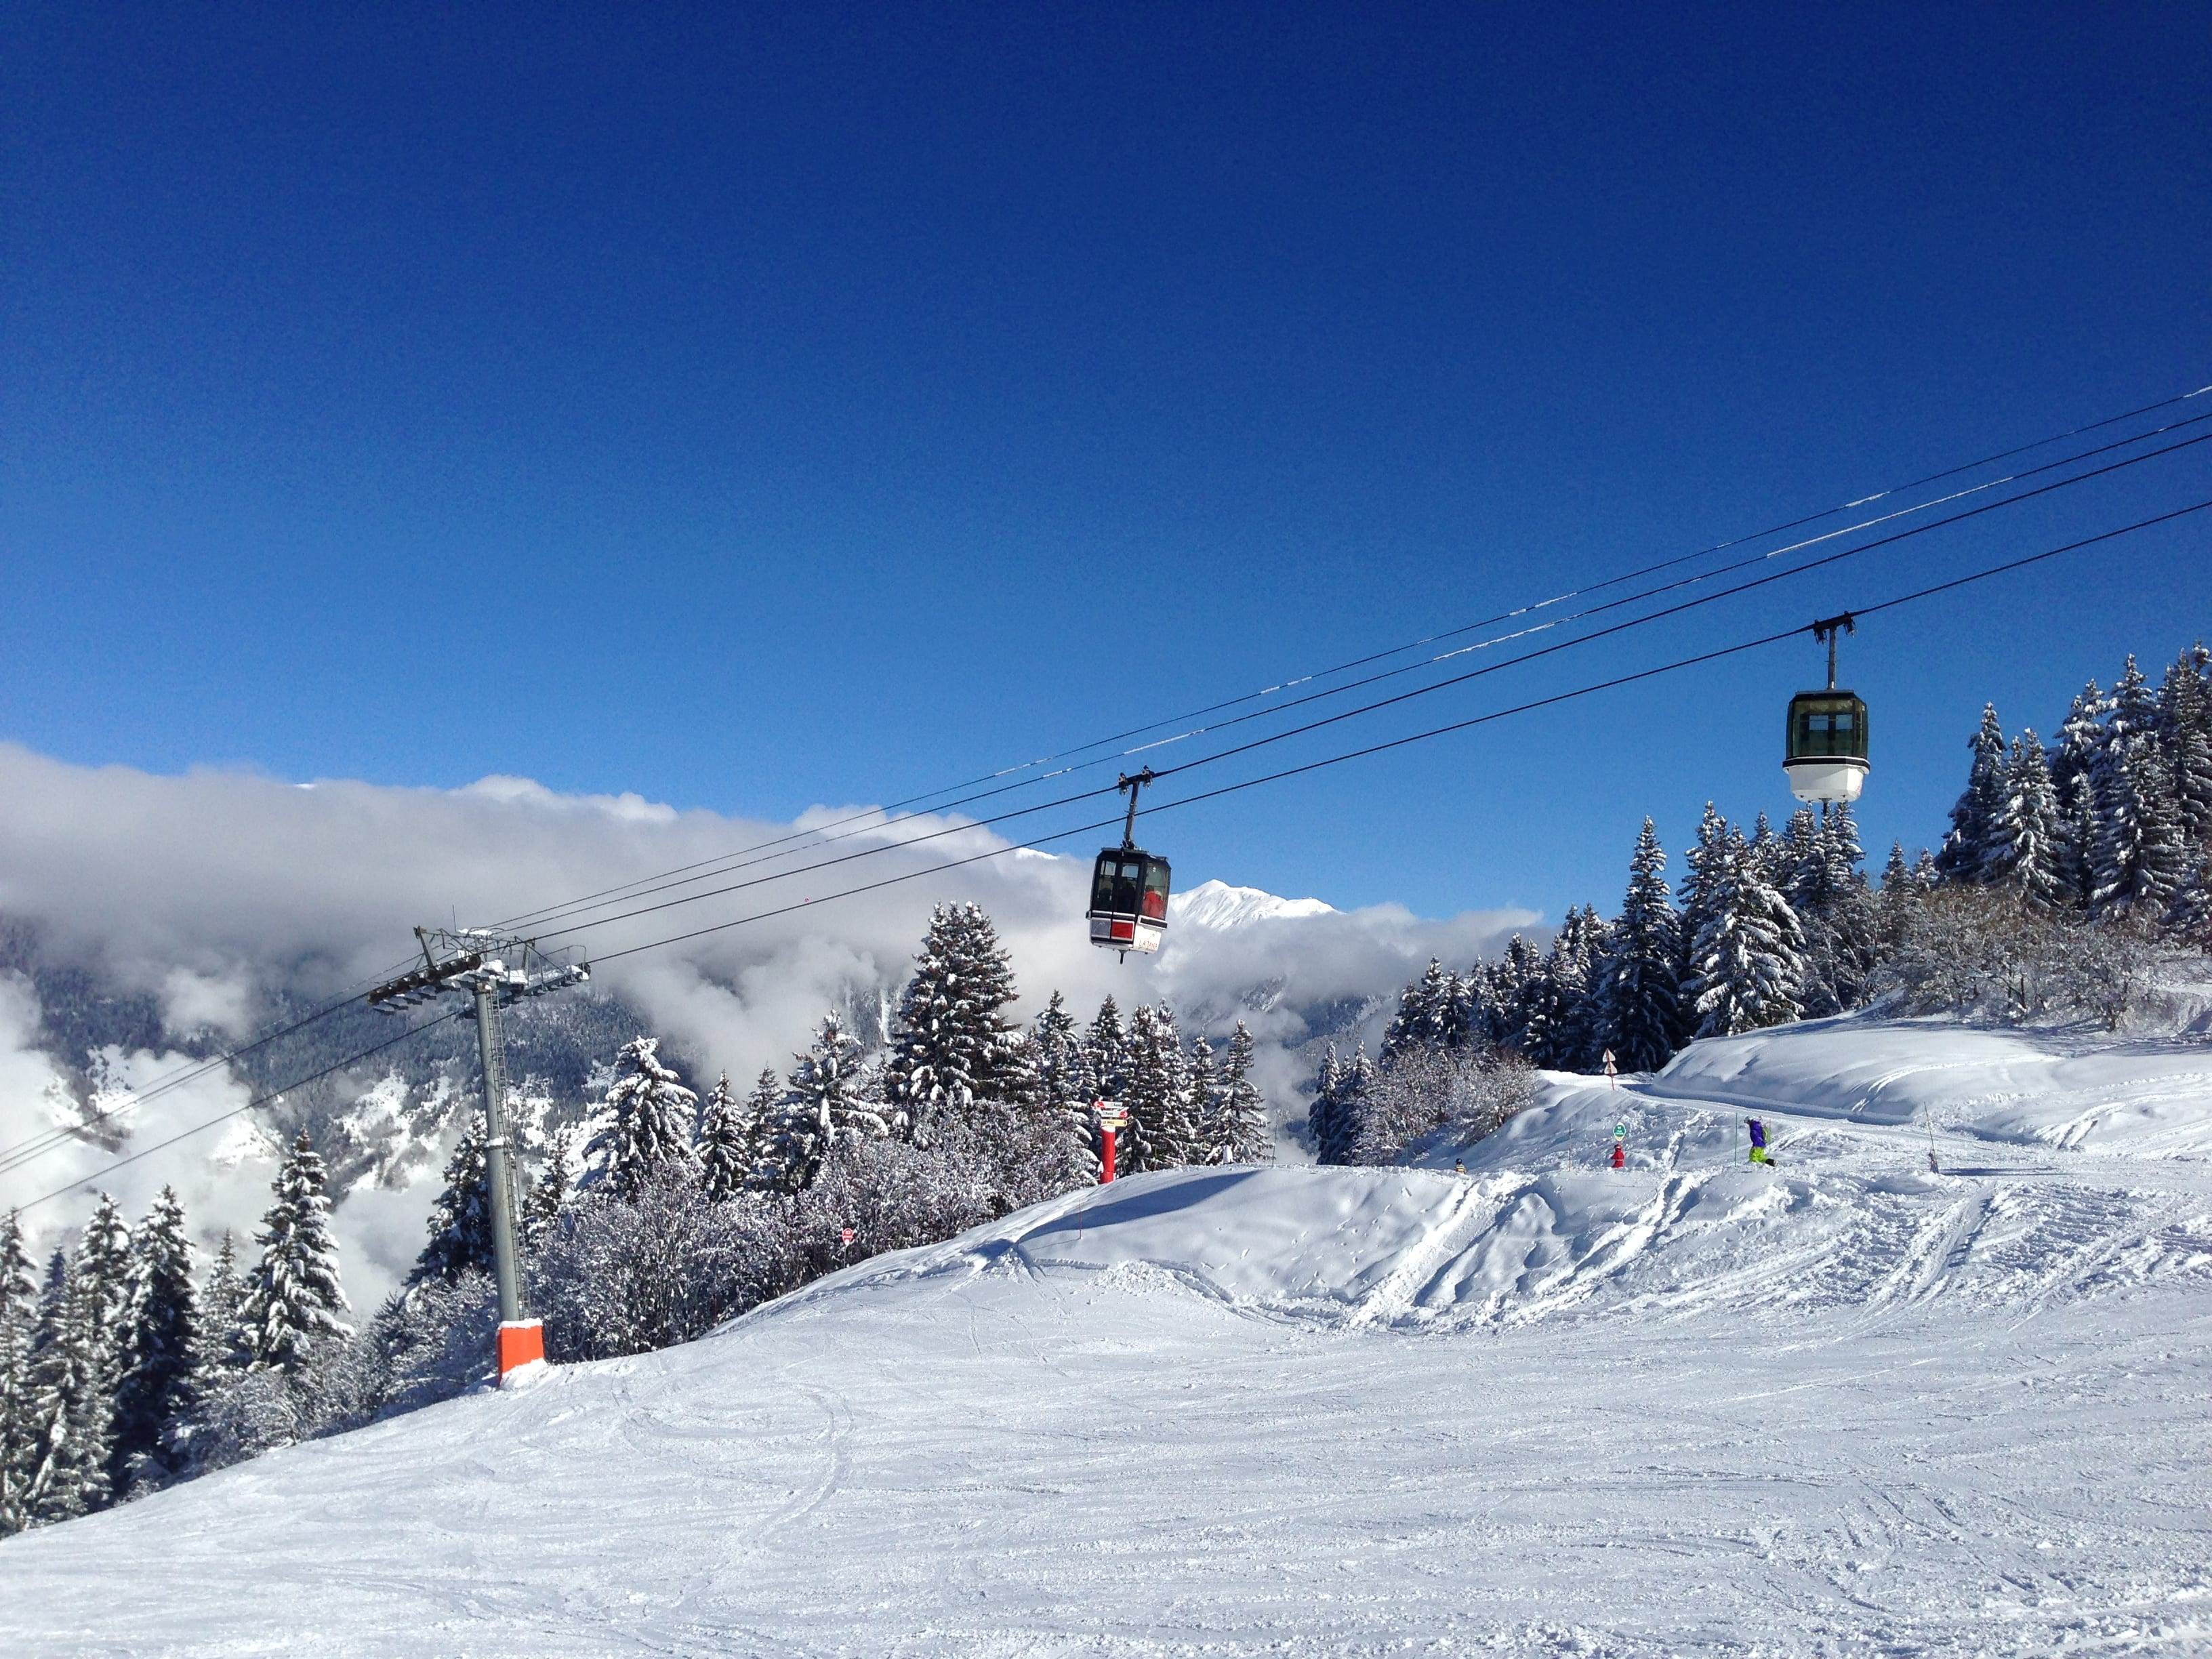 Skiing in La Tania France